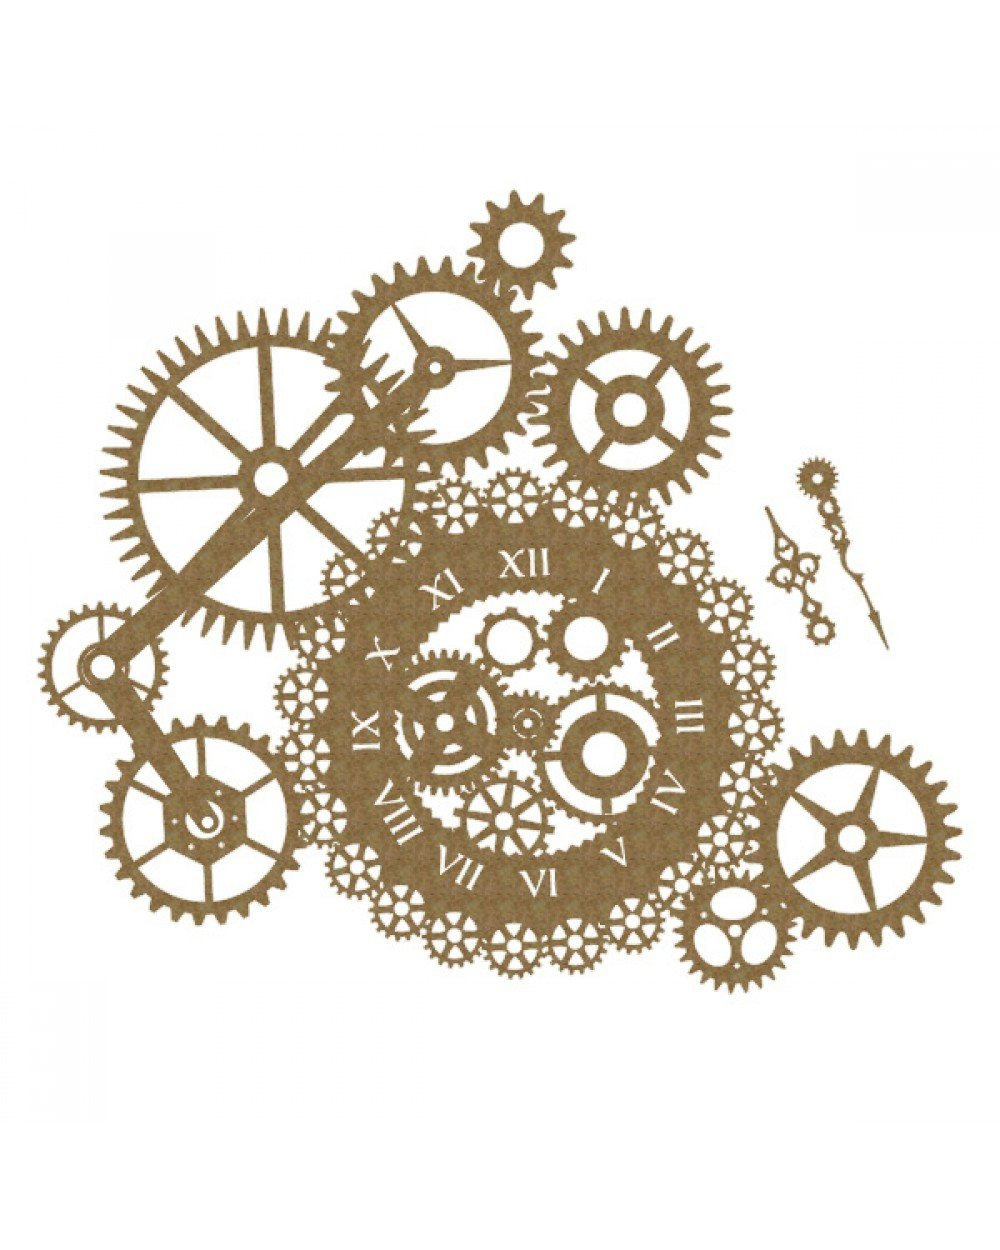 CE - Steampunk Clock & Gear Cluster